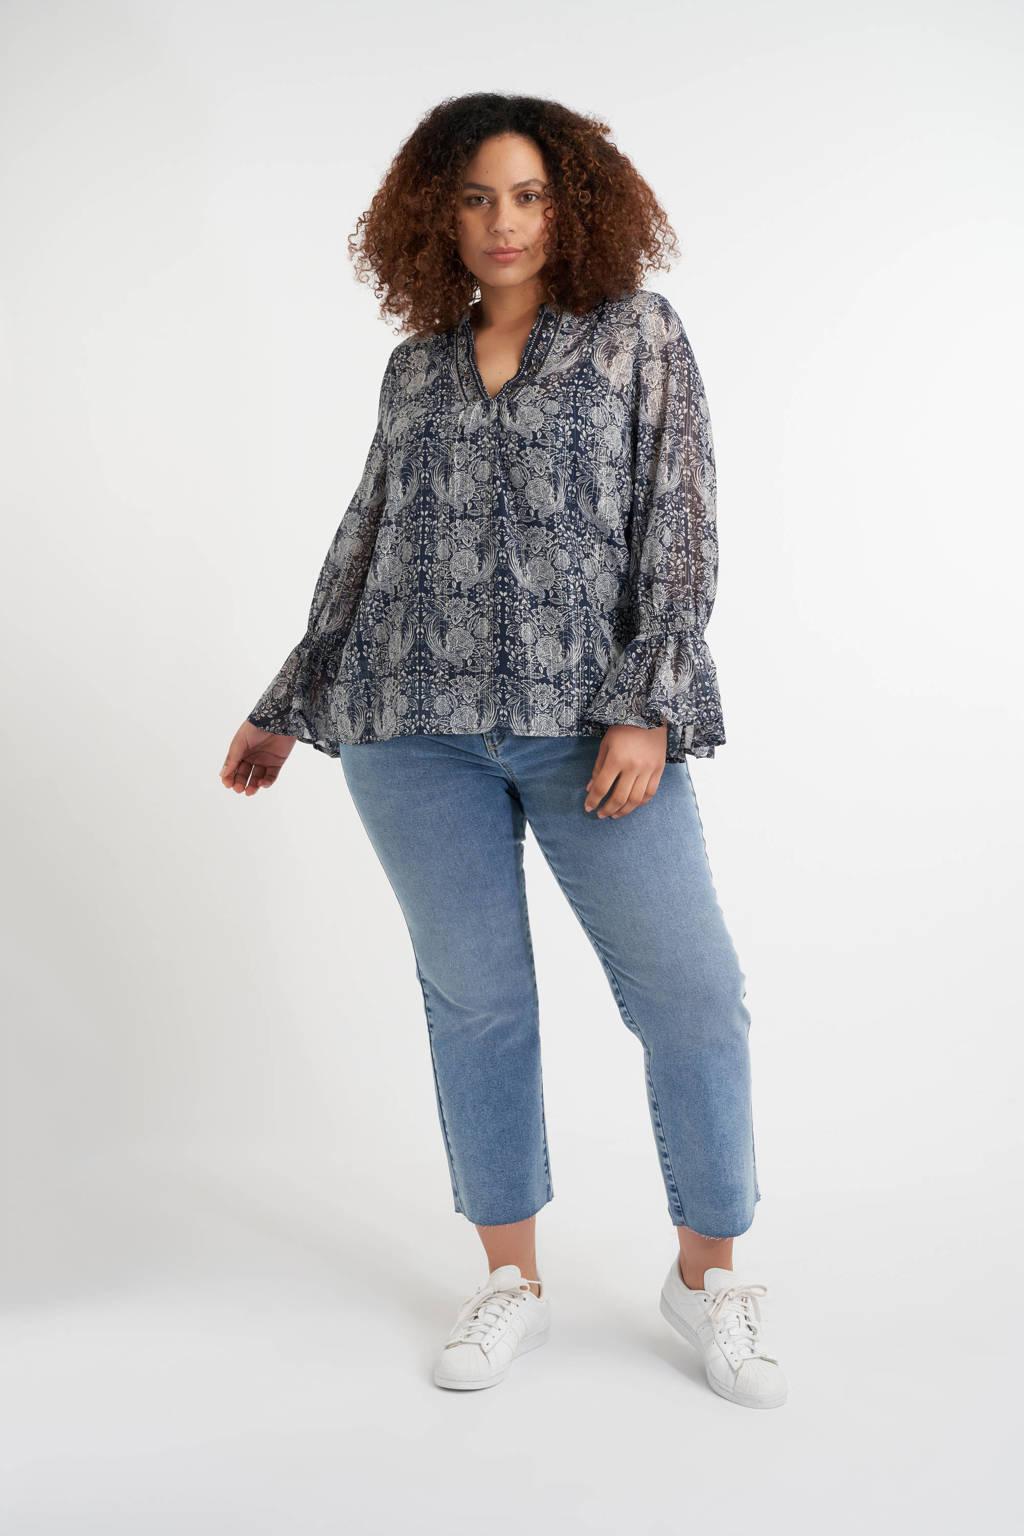 MS Mode gebloemde semi-transparante top donkerblauw/wit, Donkerblauw/wit